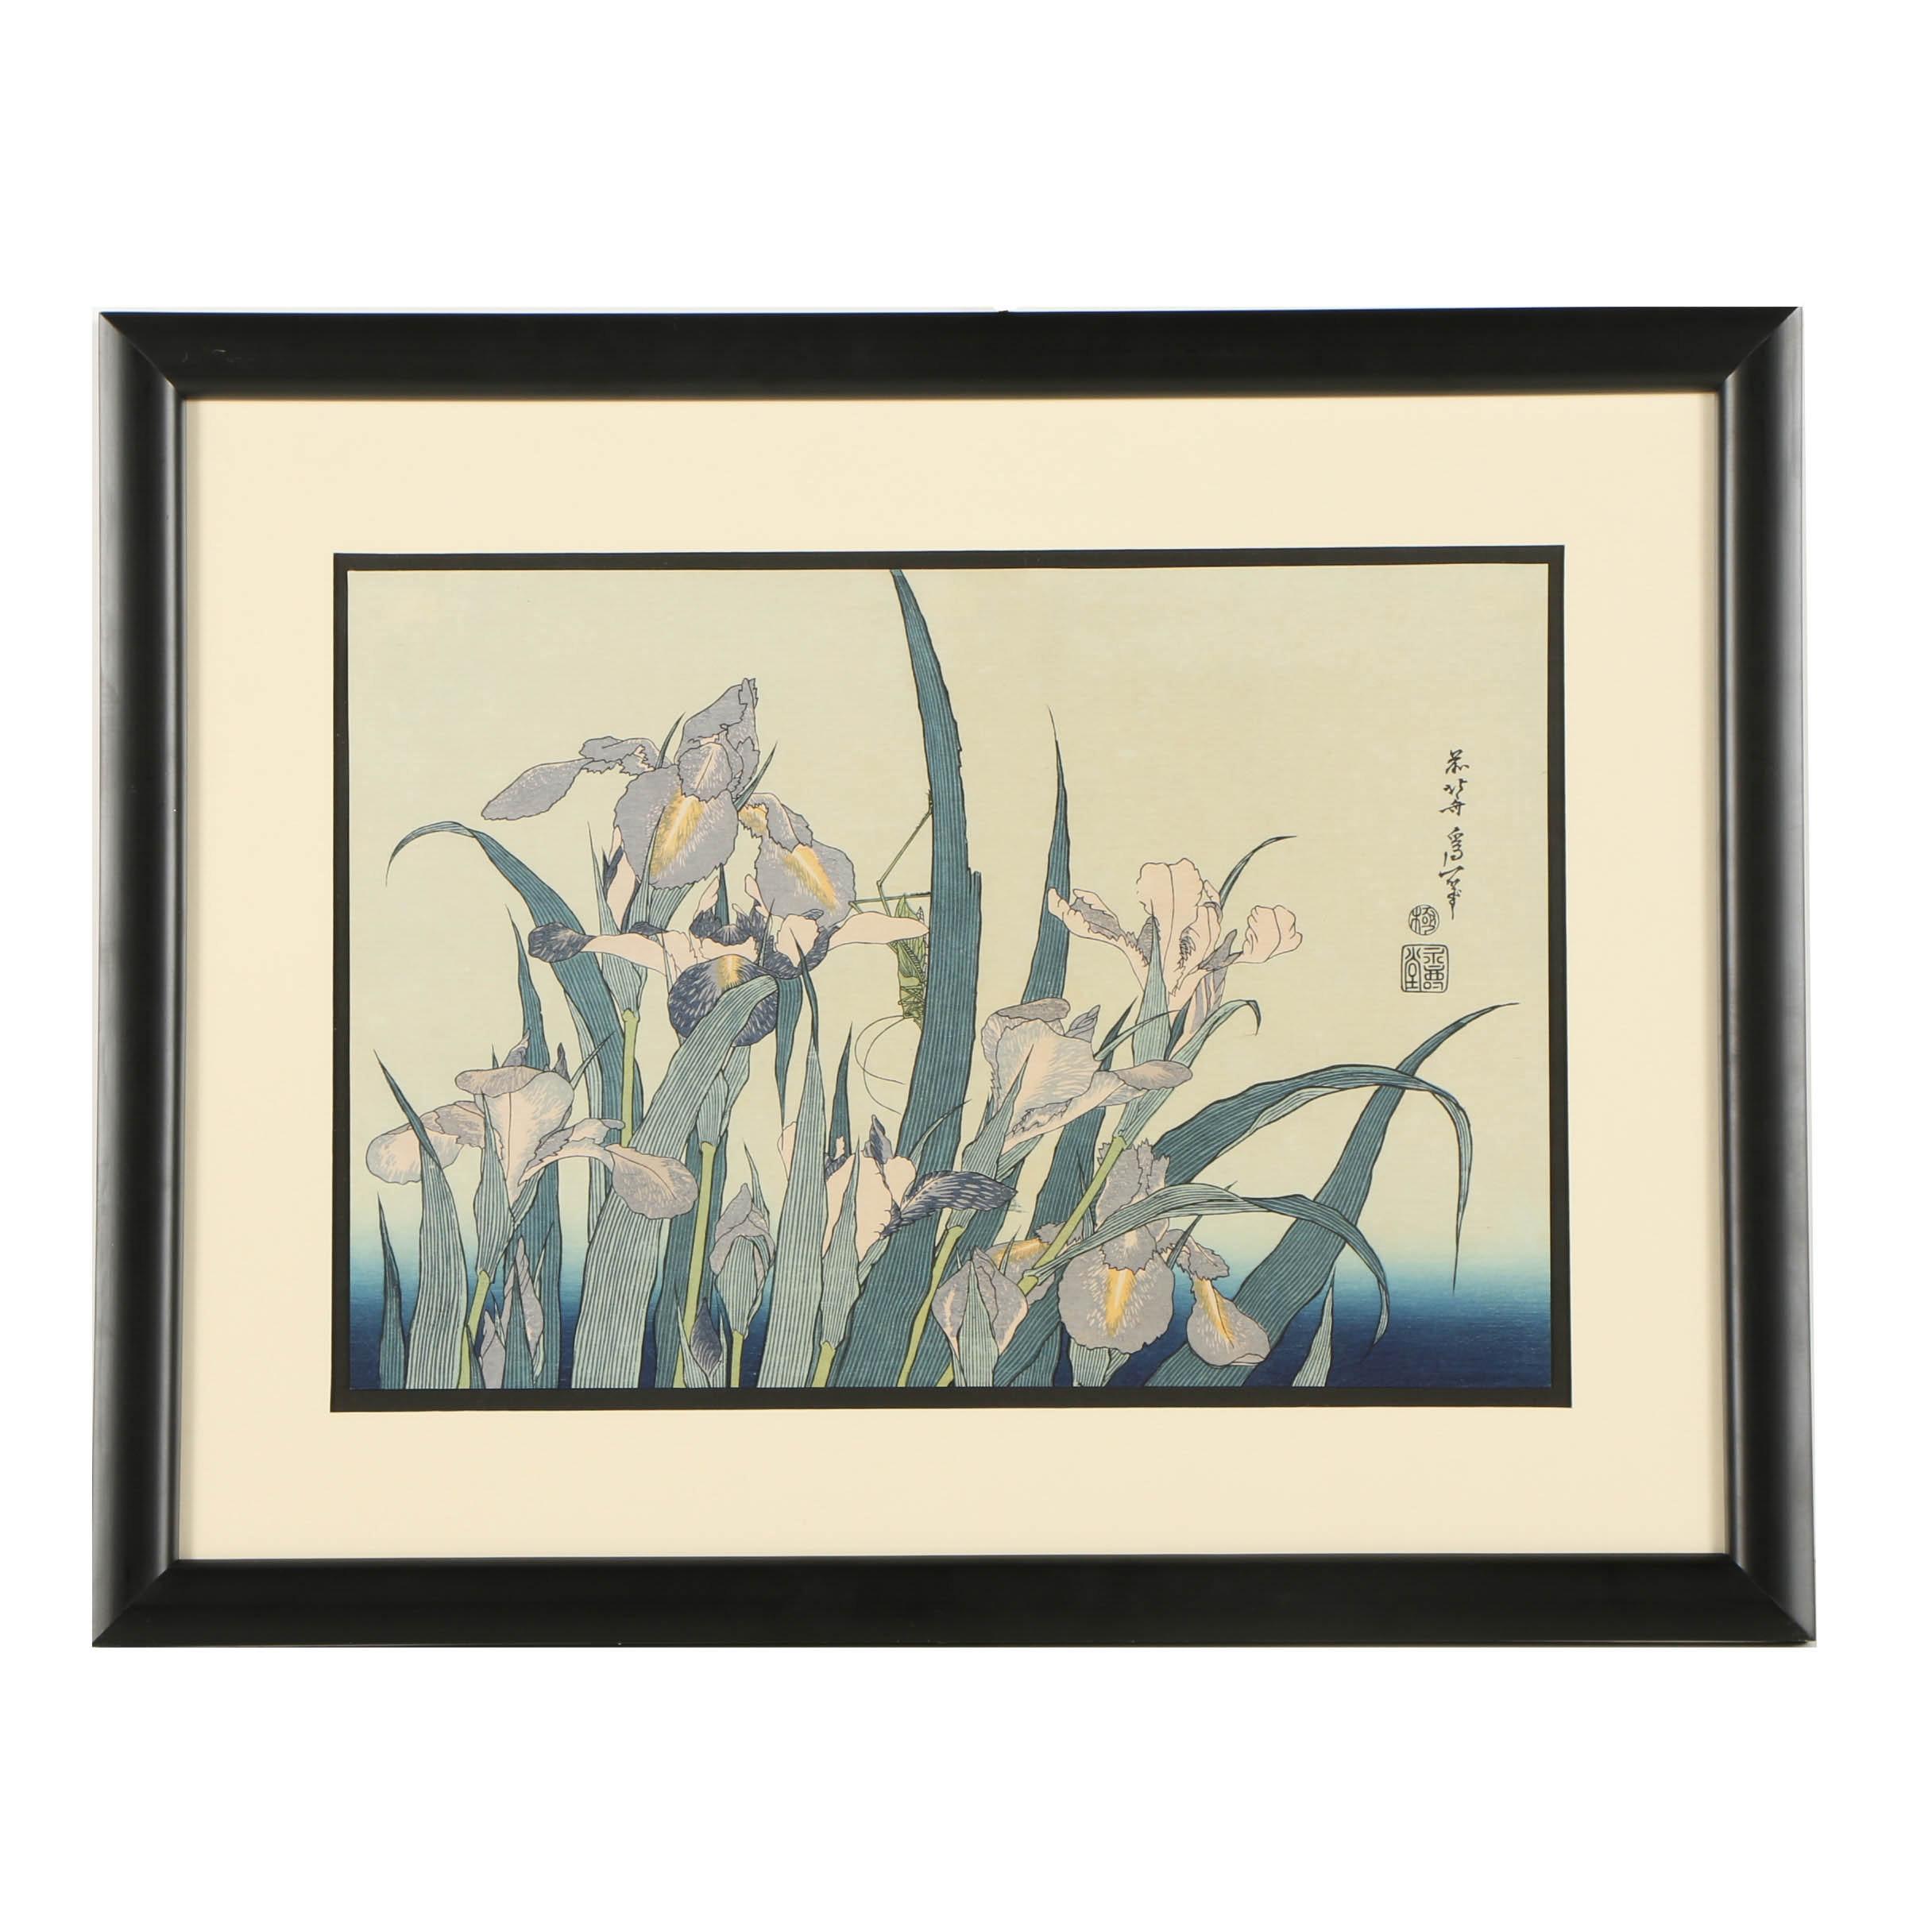 "Re-strike Woodblock ""Iris and Grasshopper"" After Katsushika Hokusai"